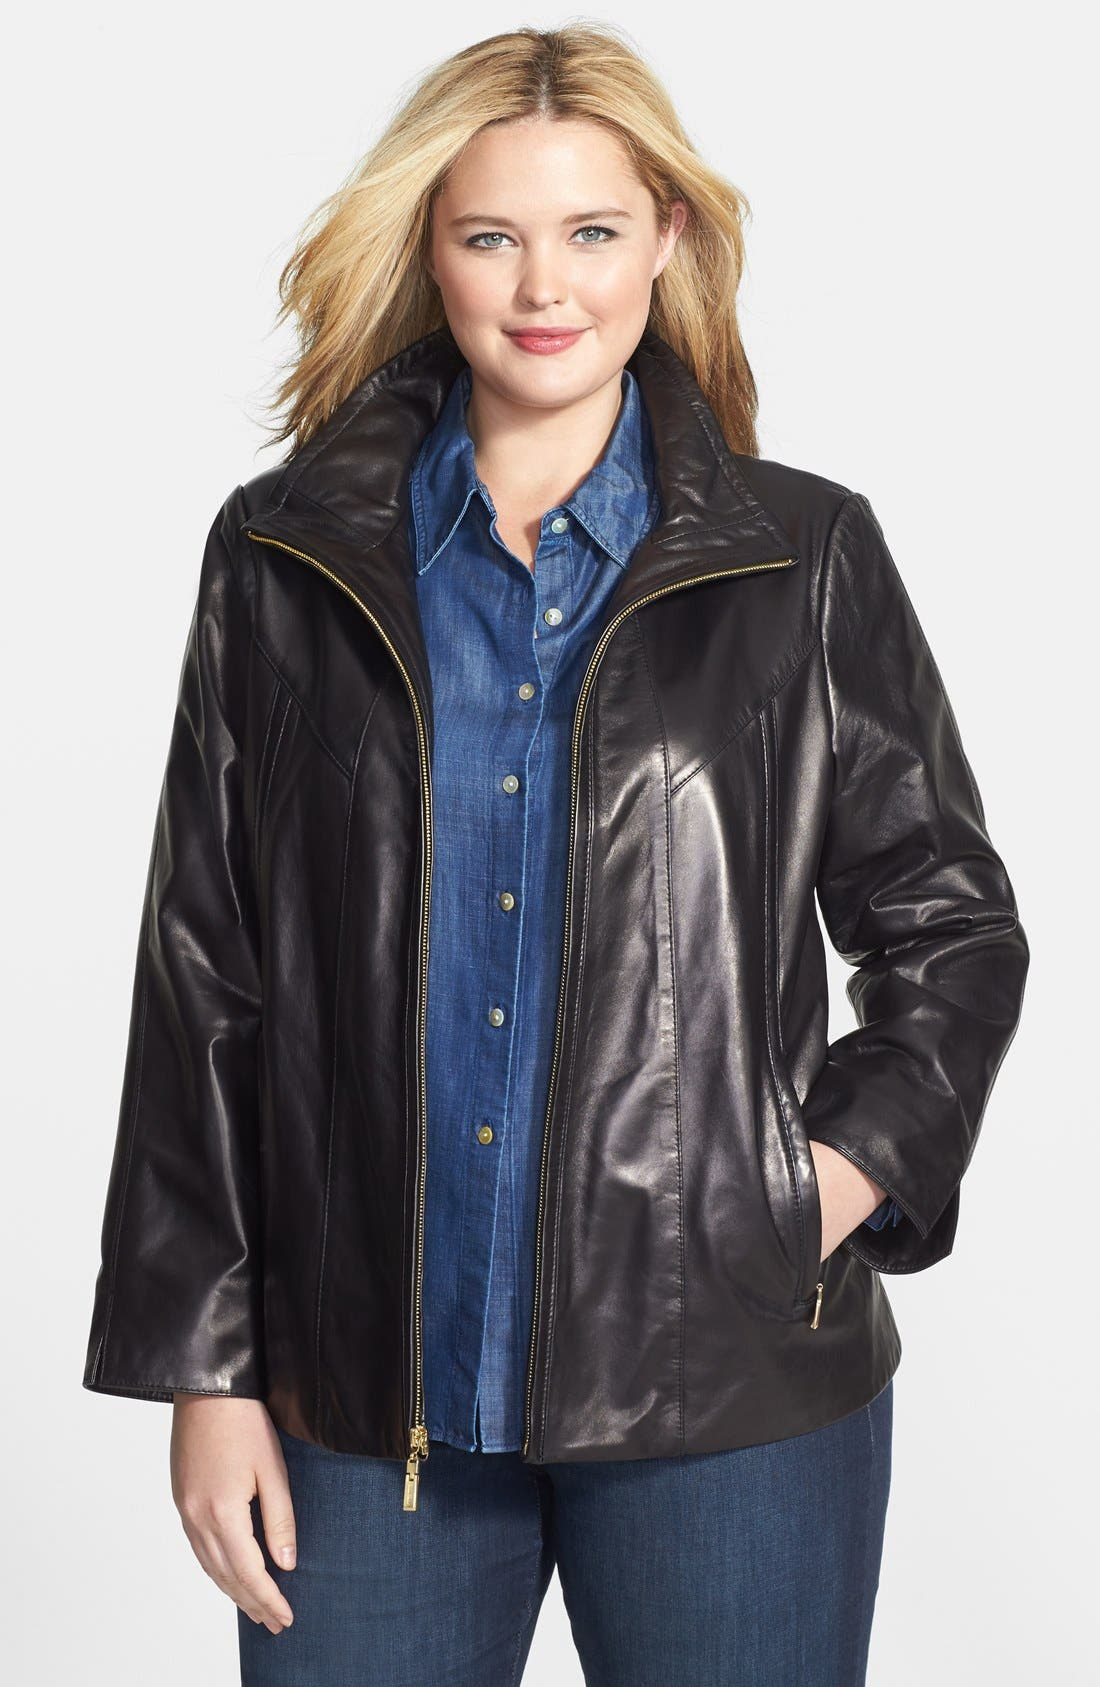 Main Image - Ellen Tracy Front Zip Lambskin Leather A-Line Jacket (Plus Size)